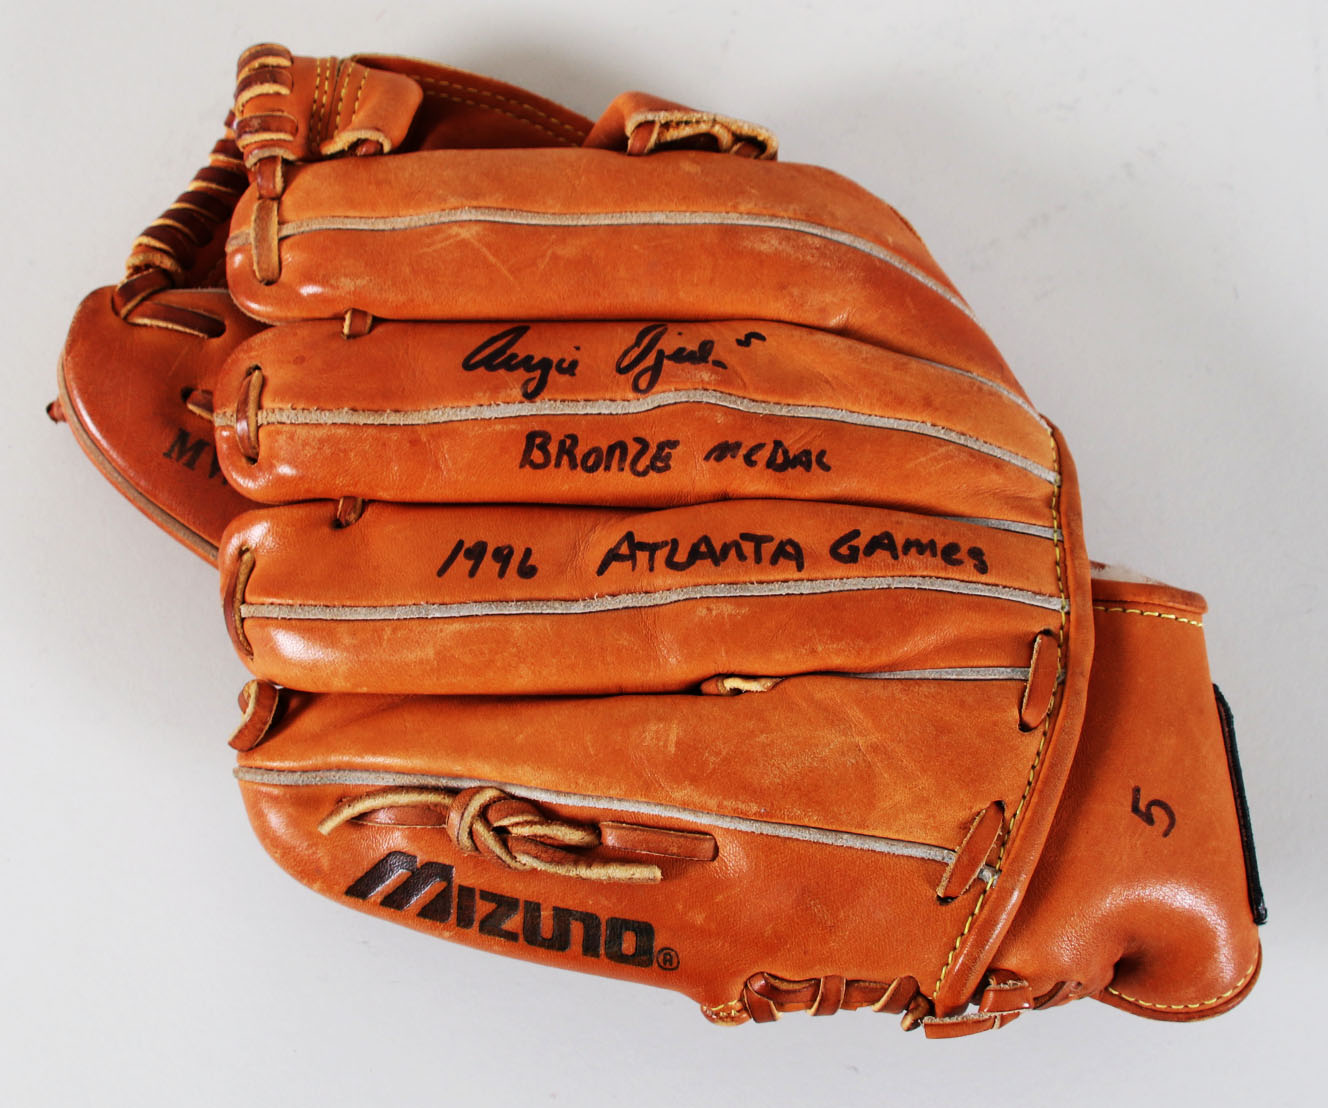 88dac83e082 1996 Augie Ojeda Worn Used Baseball Glove Signed w/Pants Olympics